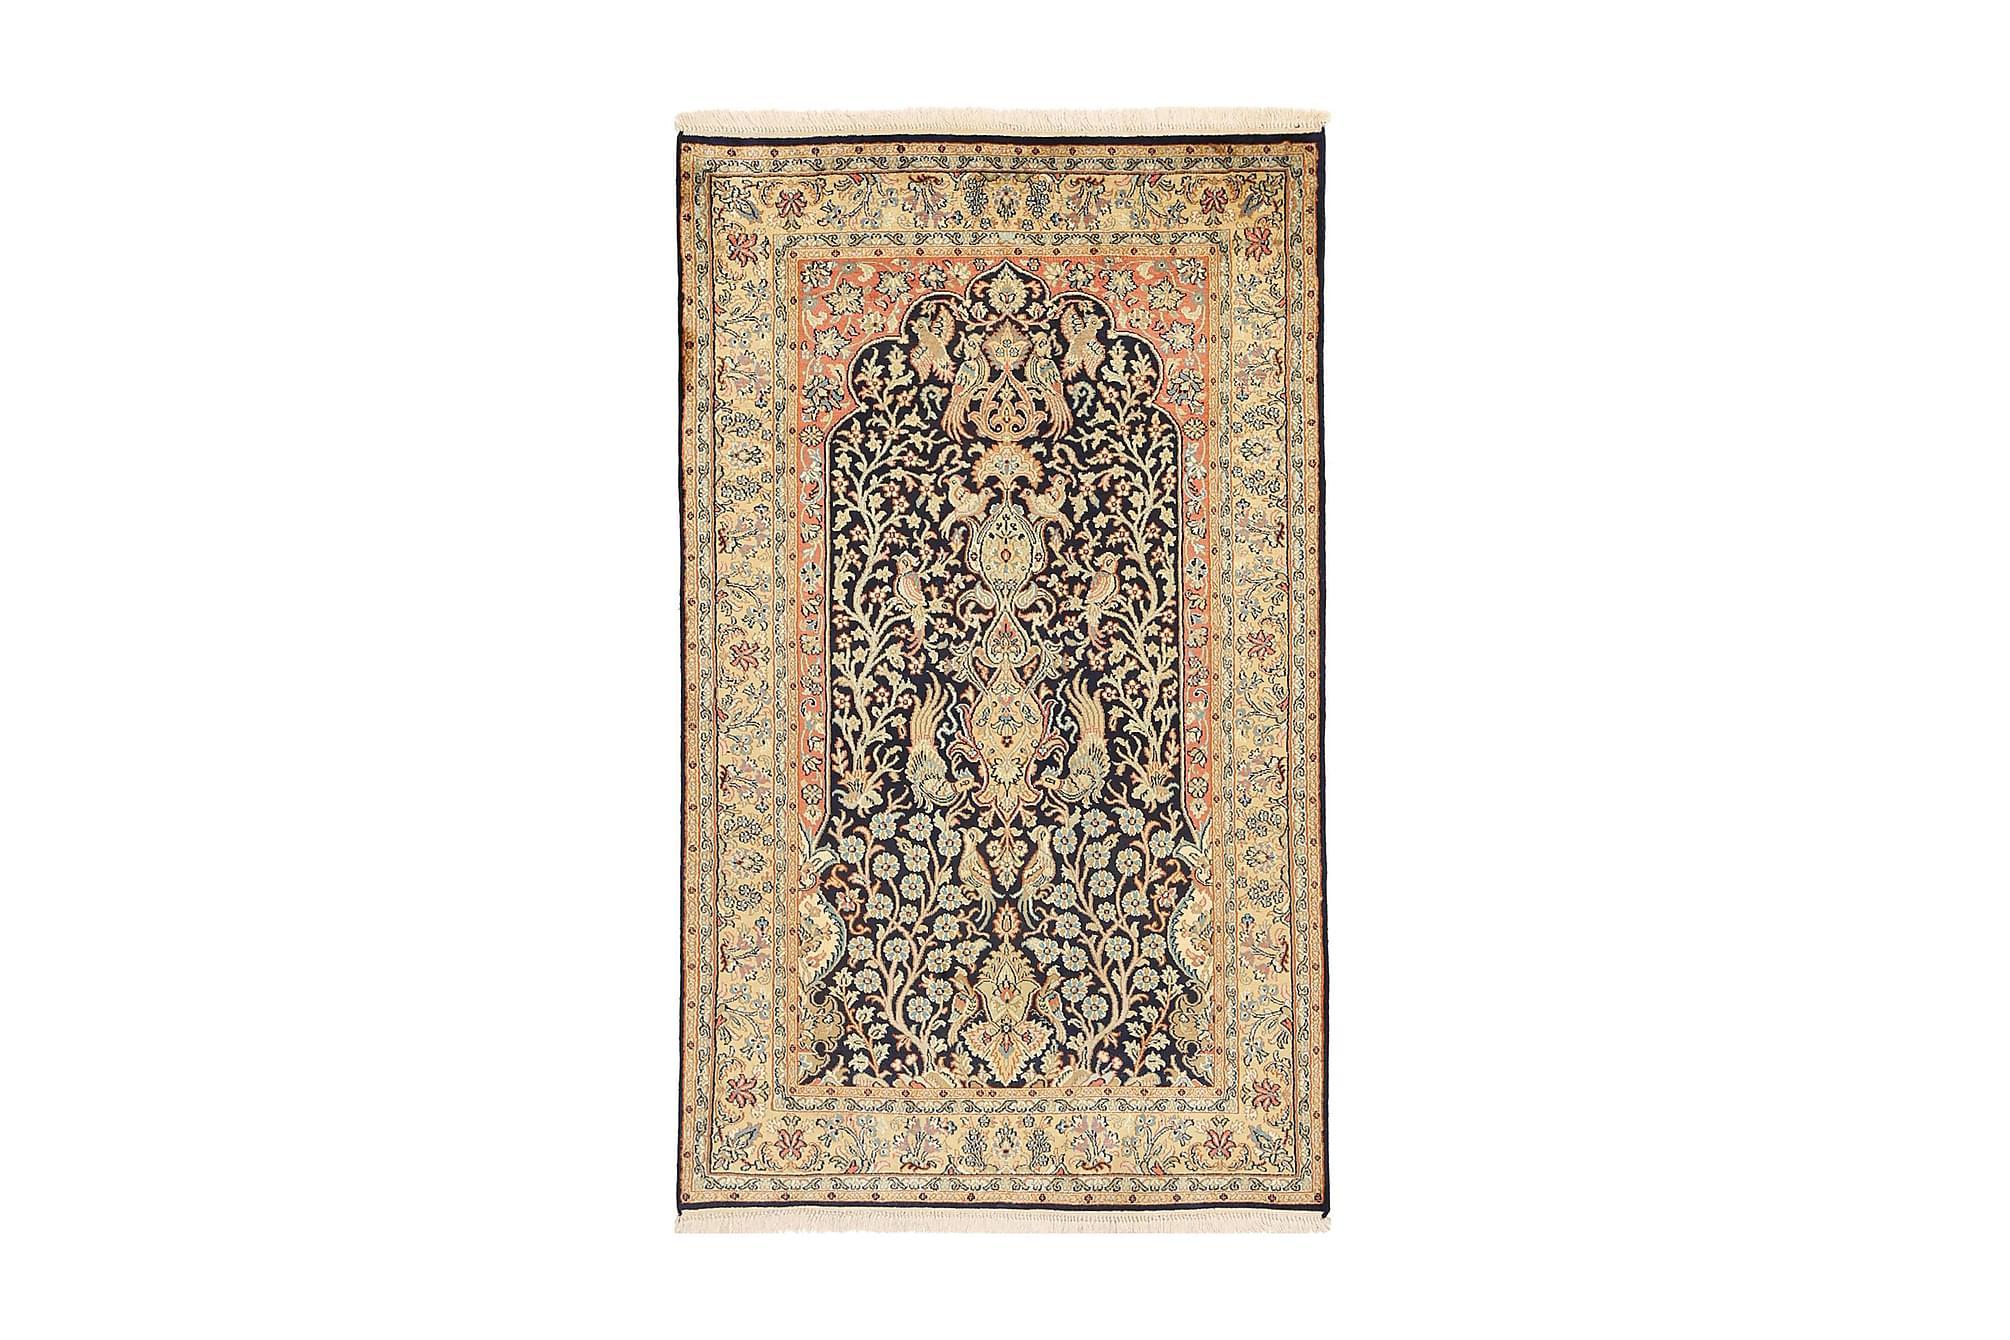 ORIENTALISK Silkesmatta Kashmir 91x152, Äkta silkesmattor